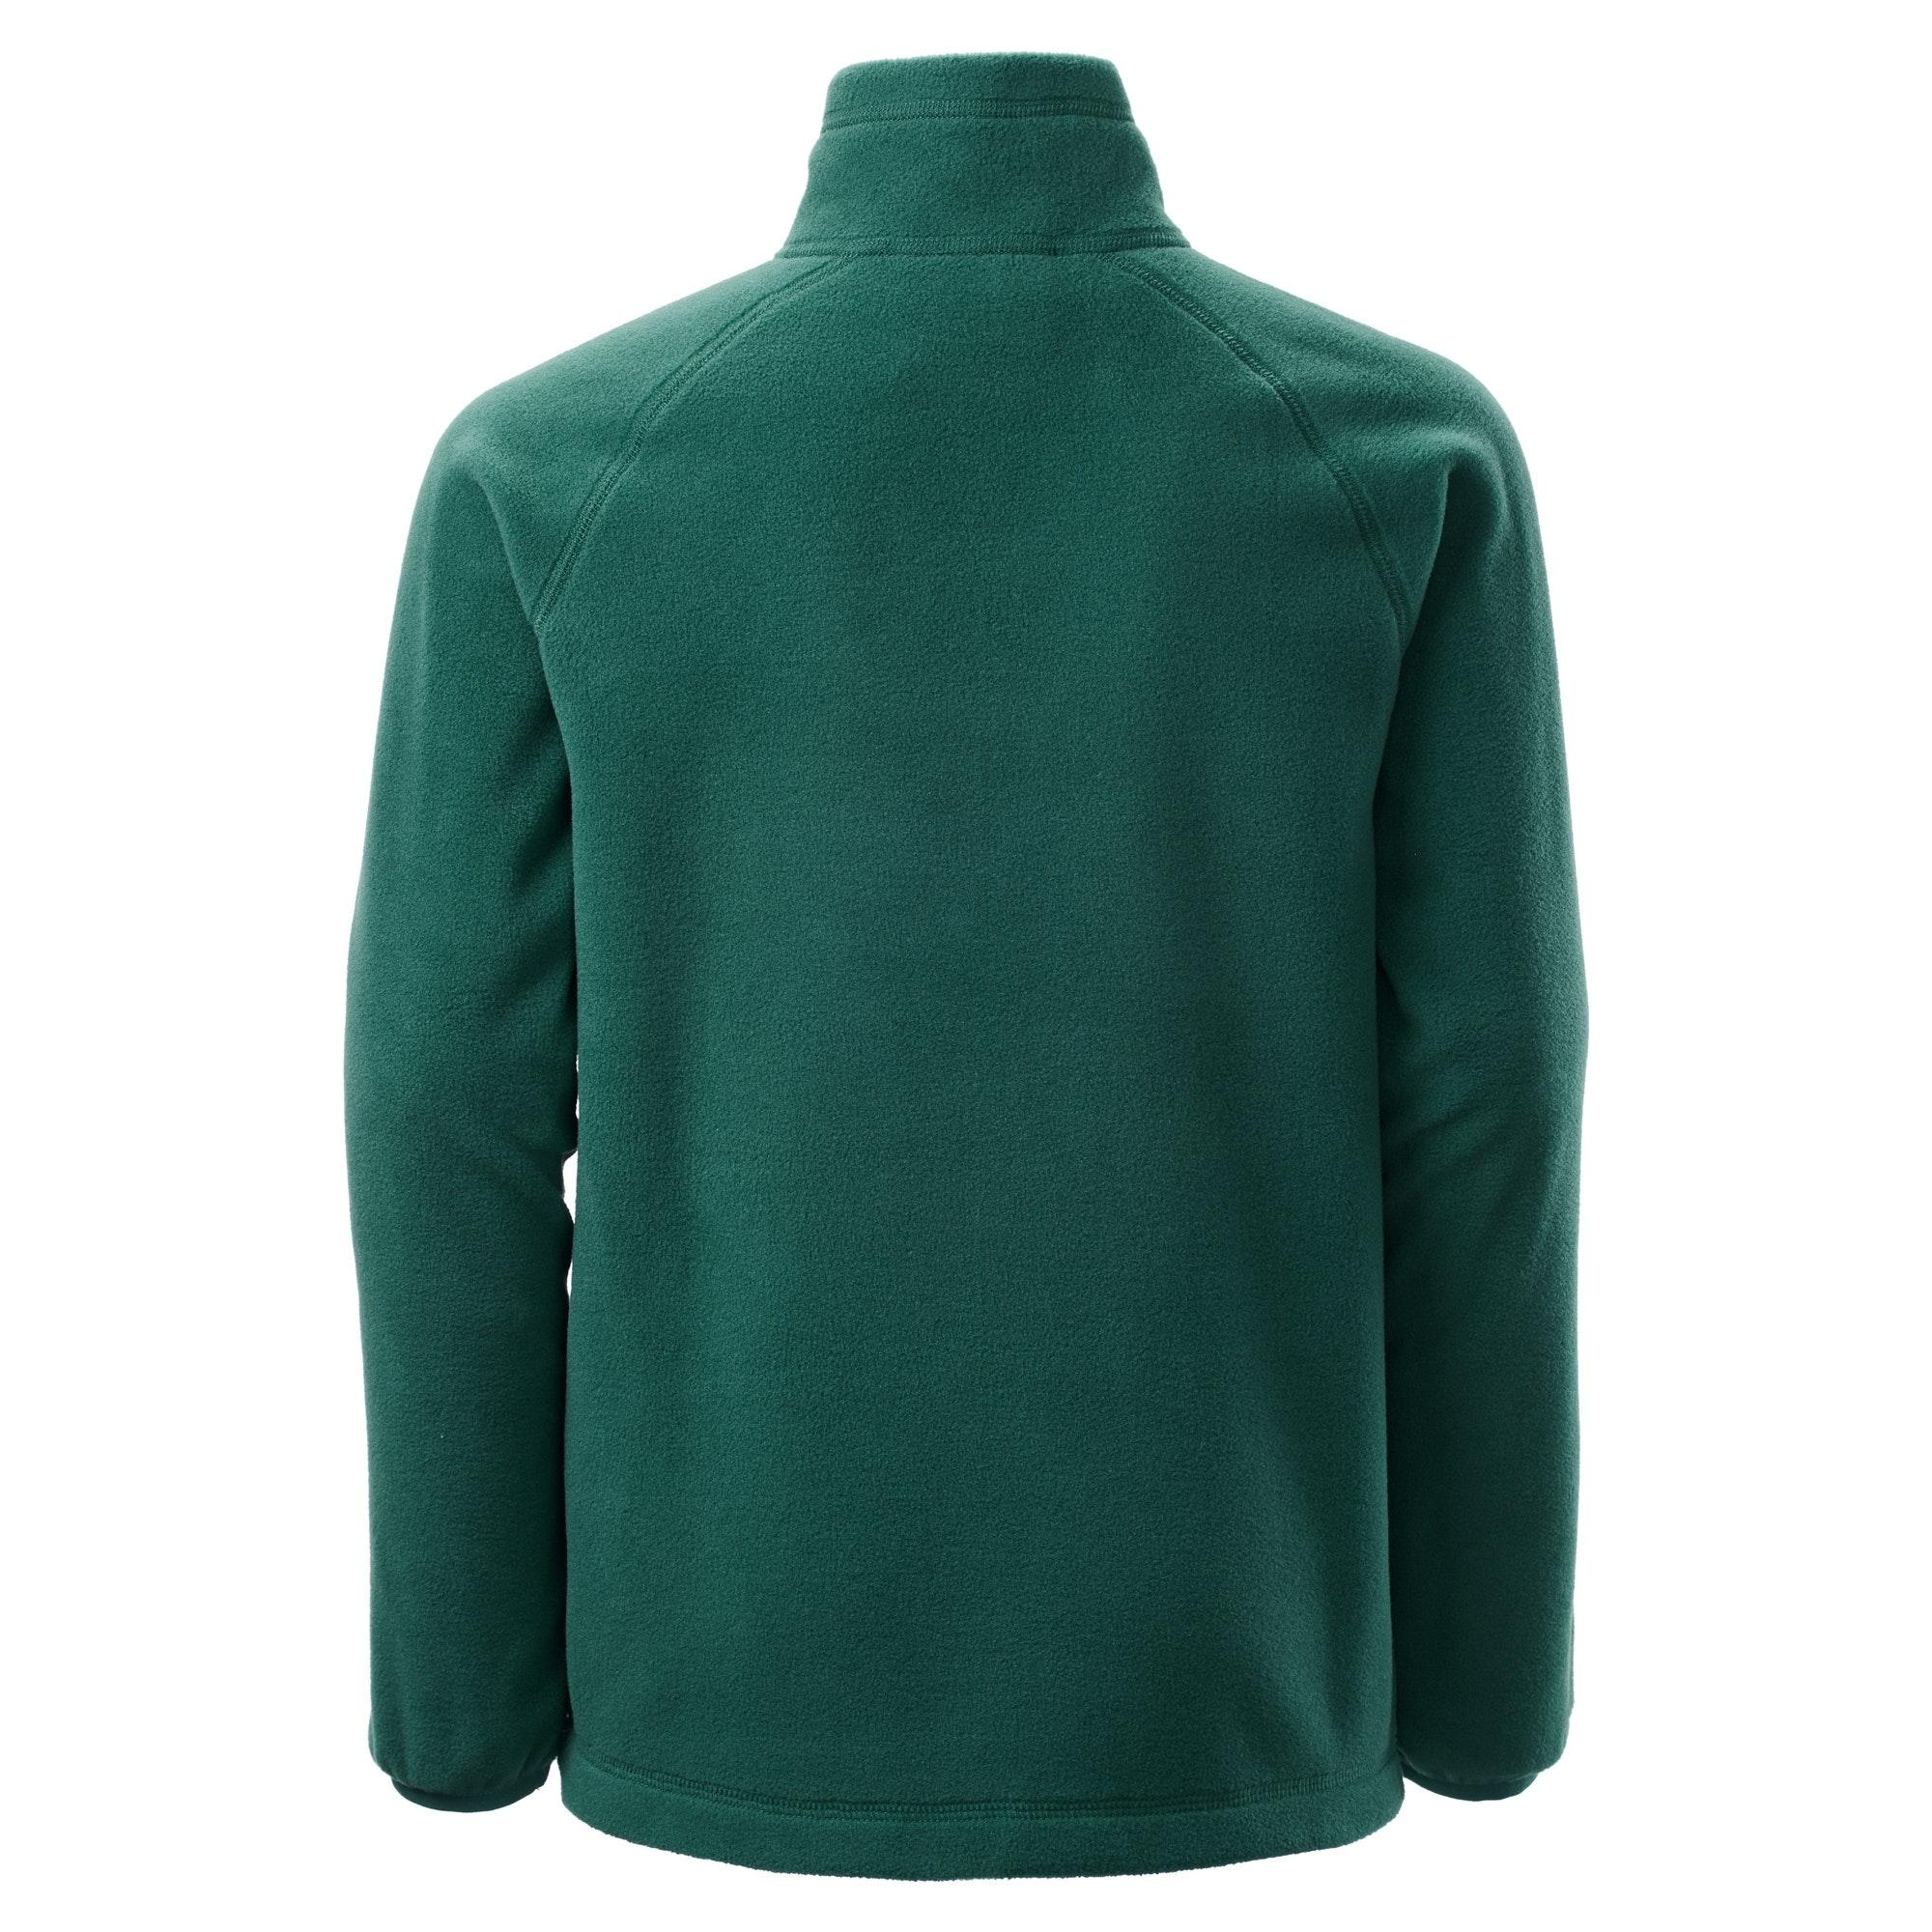 NEW-Kathmandu-Ridge-Kids-039-Girls-039-Boys-039-Warm-Fleece-Jacket-1-4-Zip-Pullover-Top thumbnail 16